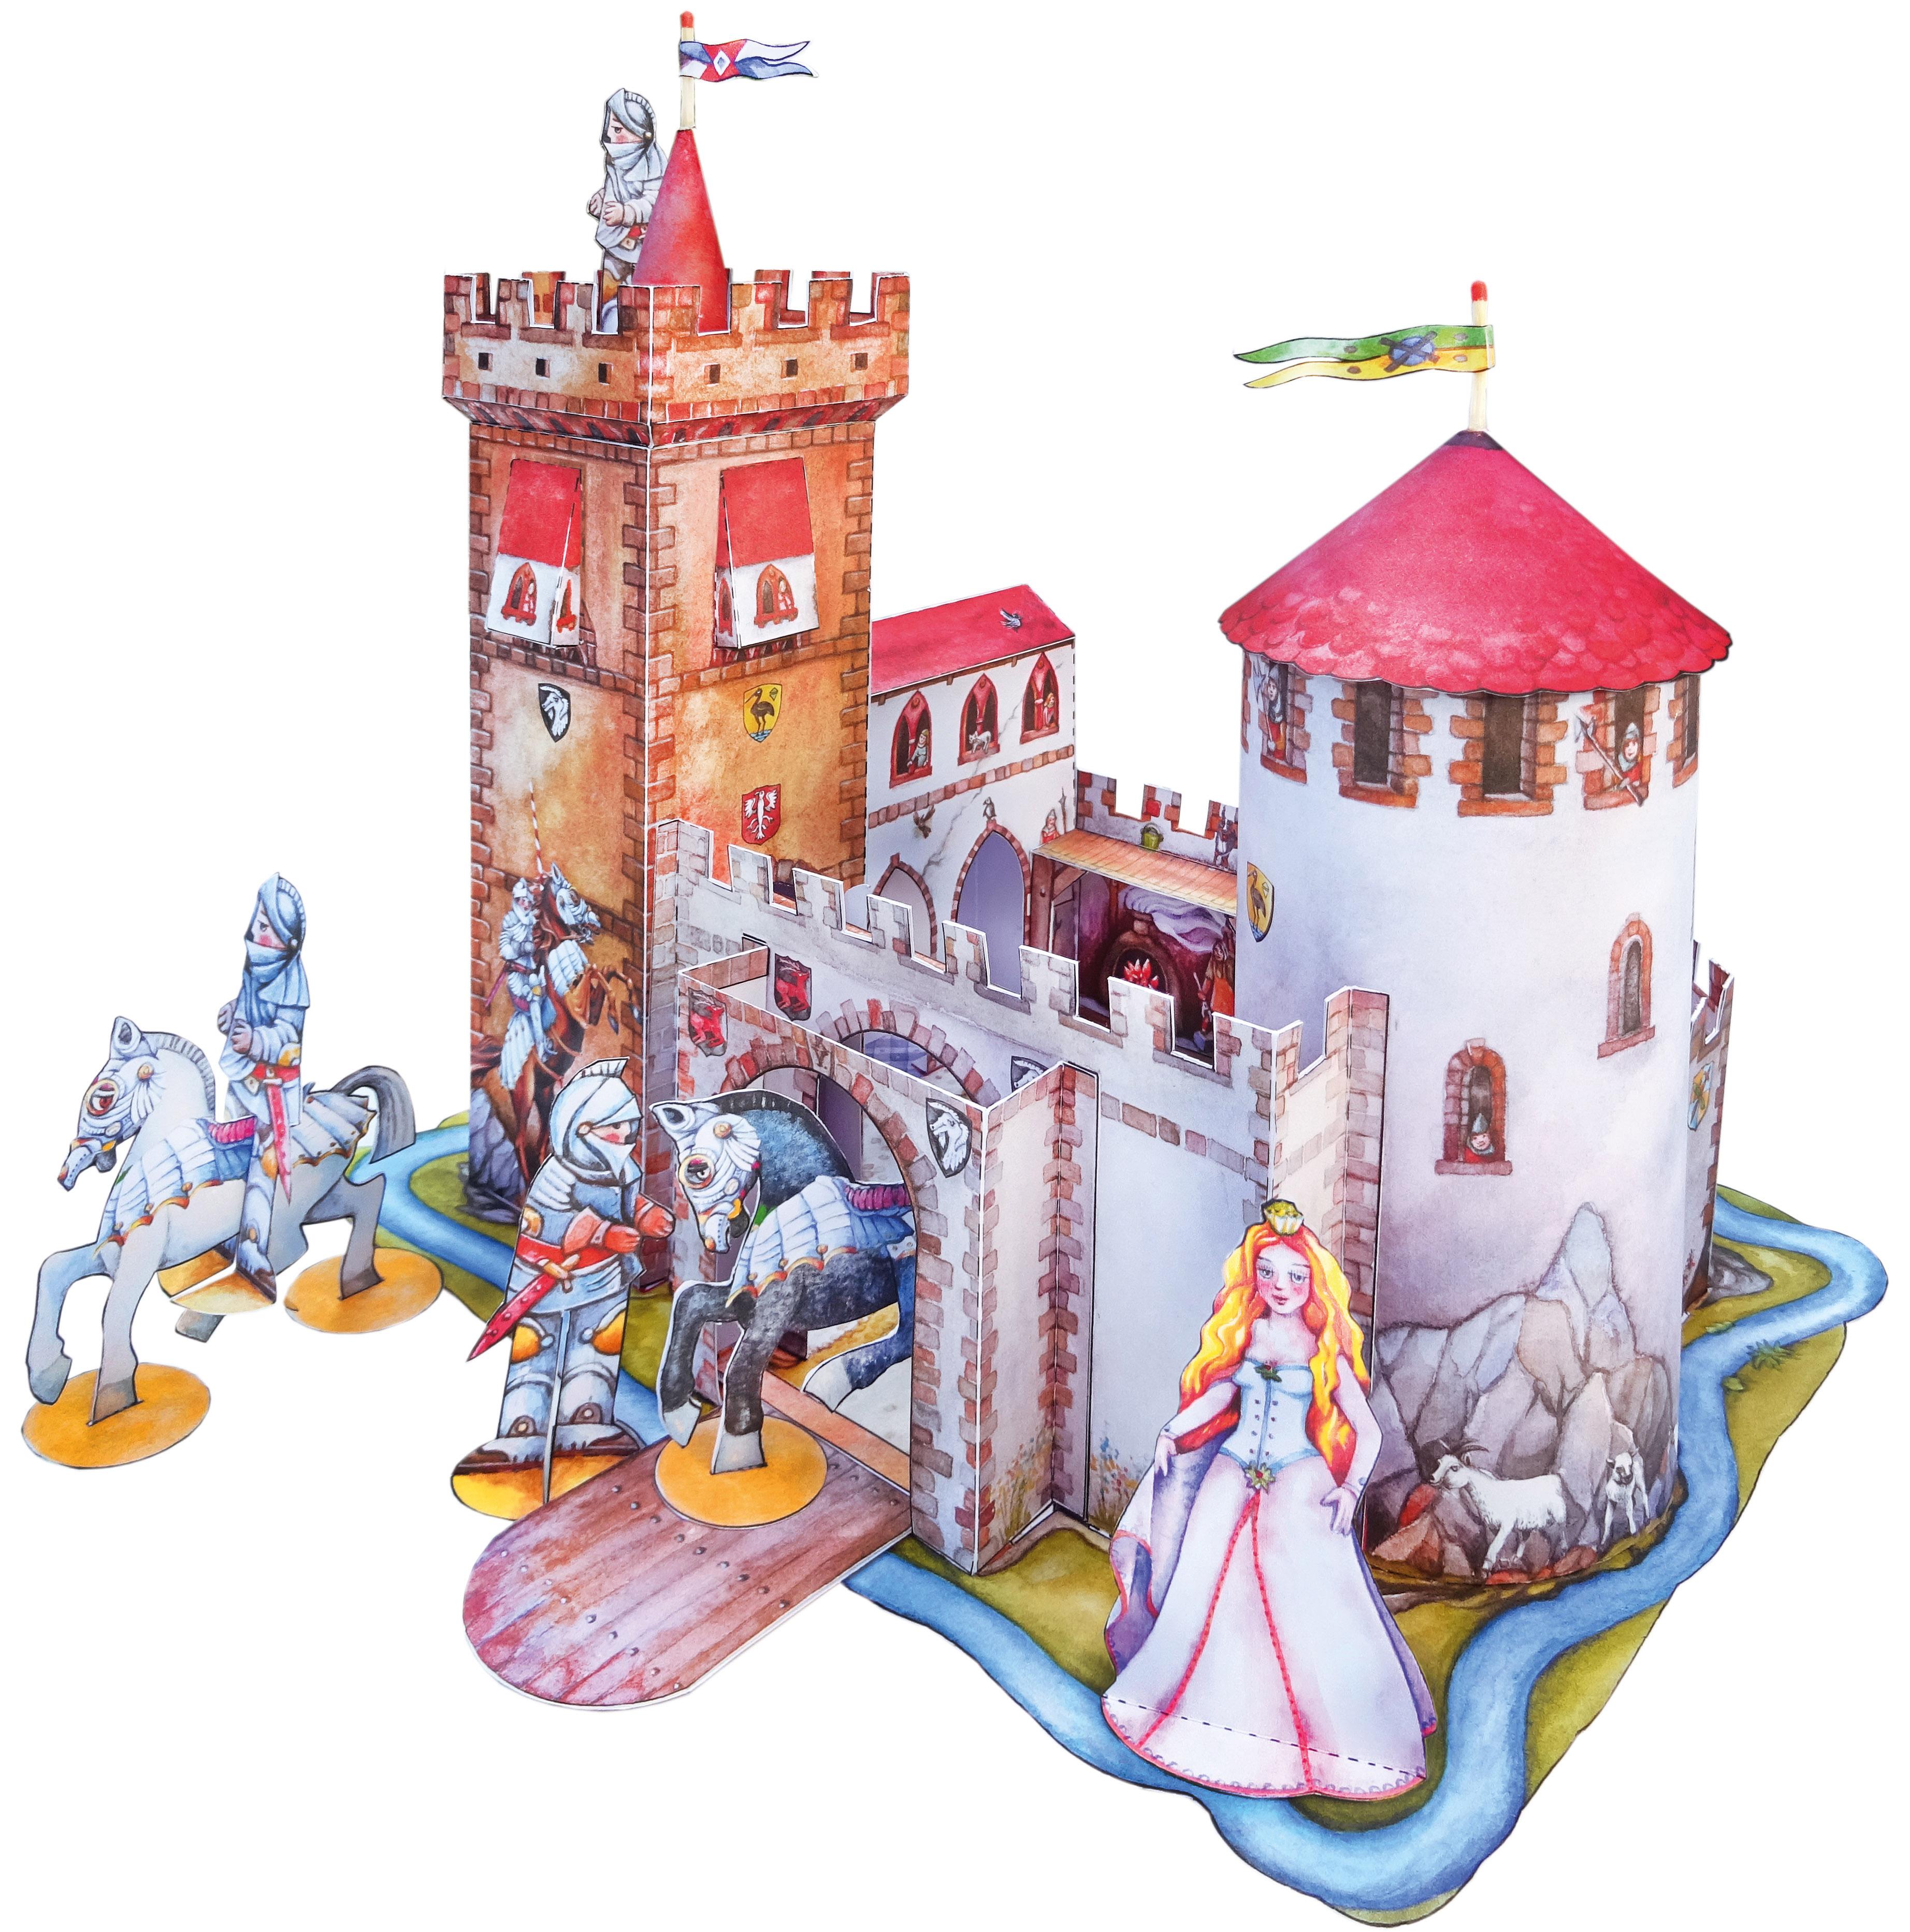 Ritterburg Bastelbogen für Ritter Kinder Feinmotorik Mittelalter Burg Modellbau Kurt Völtzke